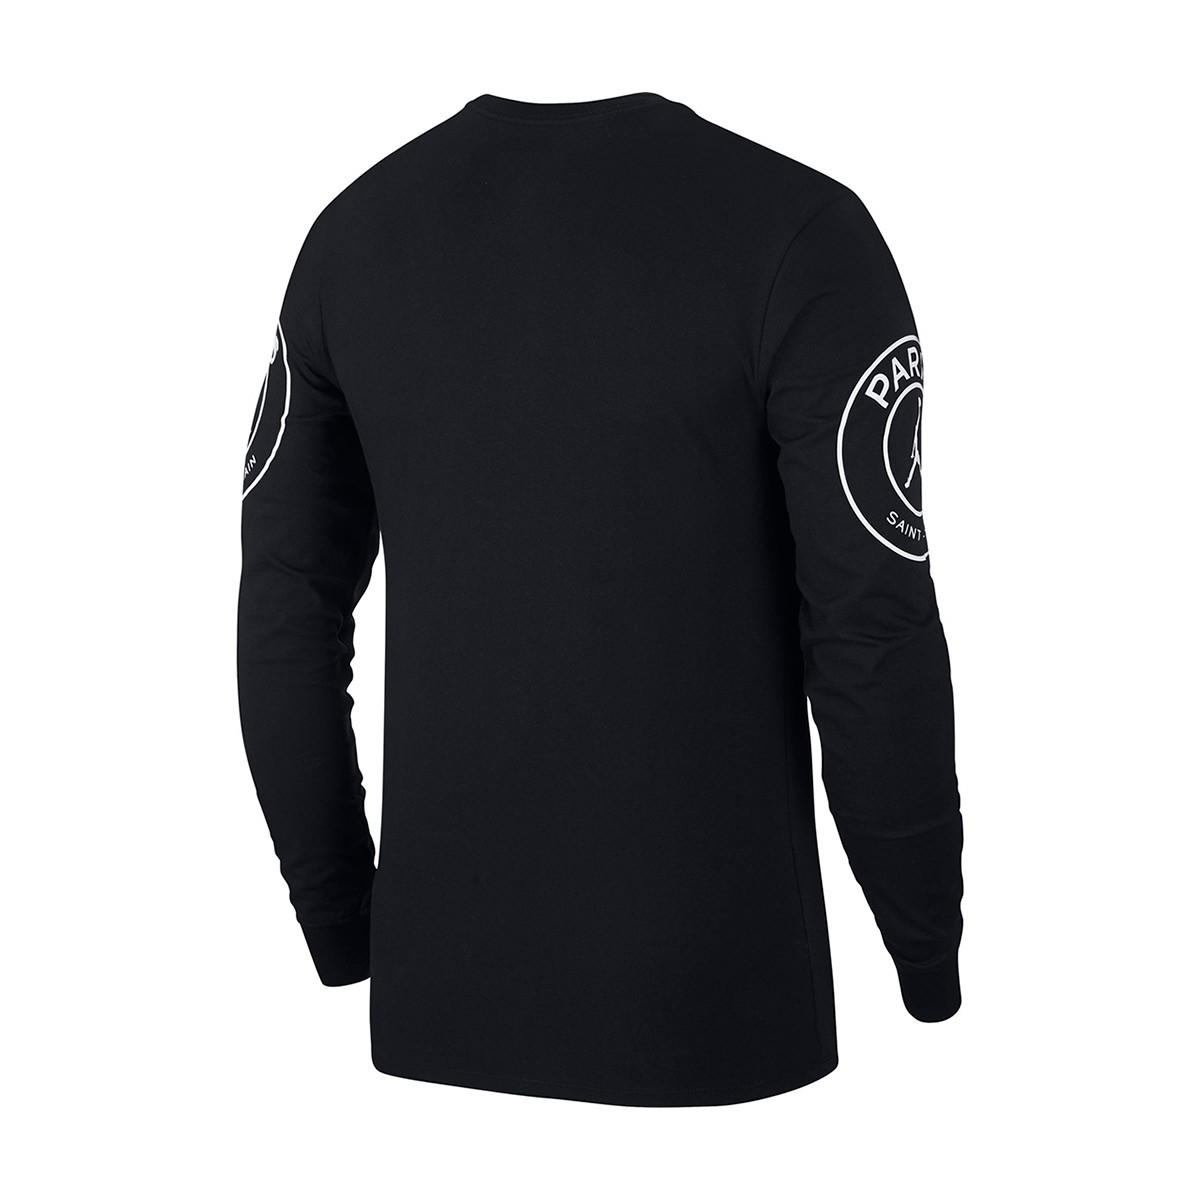 best service ee5bb b9a7e Camiseta Jordan x PSG STMT Black-White